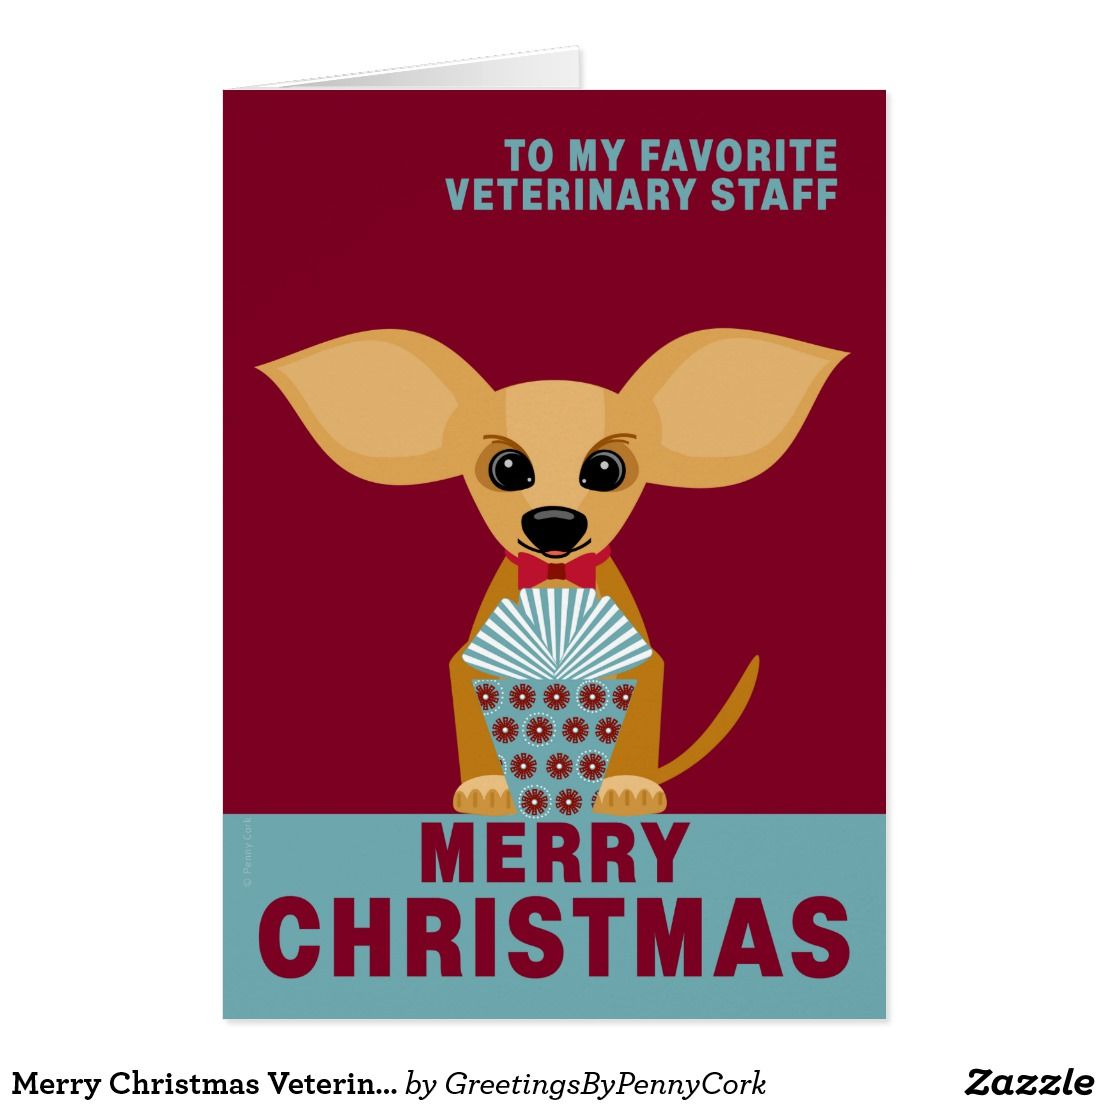 Merry Christmas Veterinary Staff Cute Chihuahua Custom Christmas